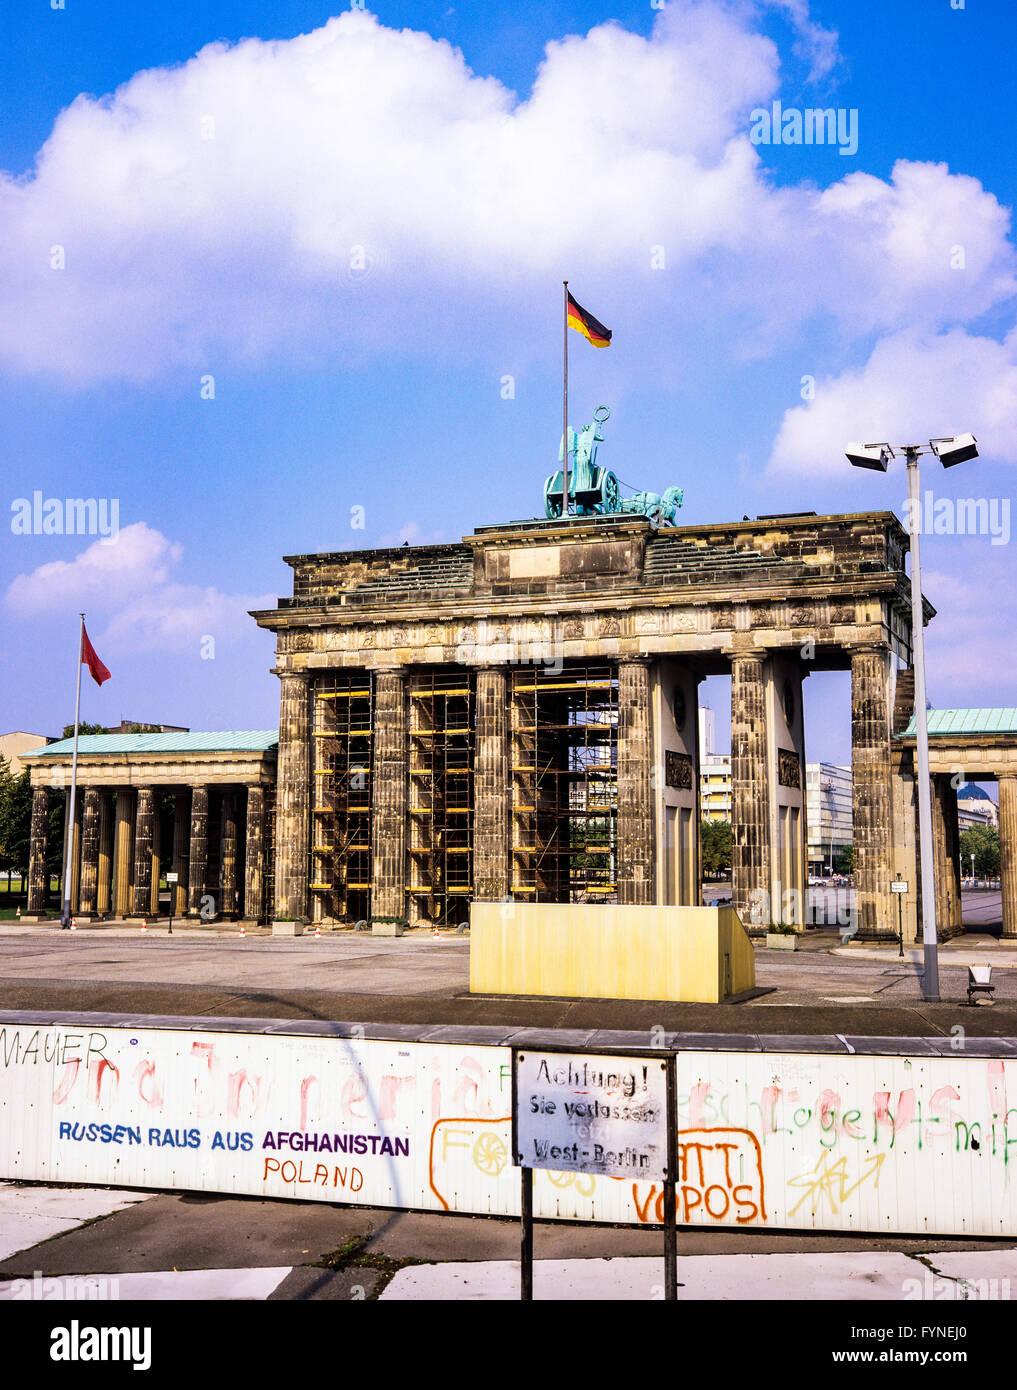 August 1986, Berlin Wall and Brandenburg Gate in East Berlin, West Berlin side, Germany, Europe, Stock Photo